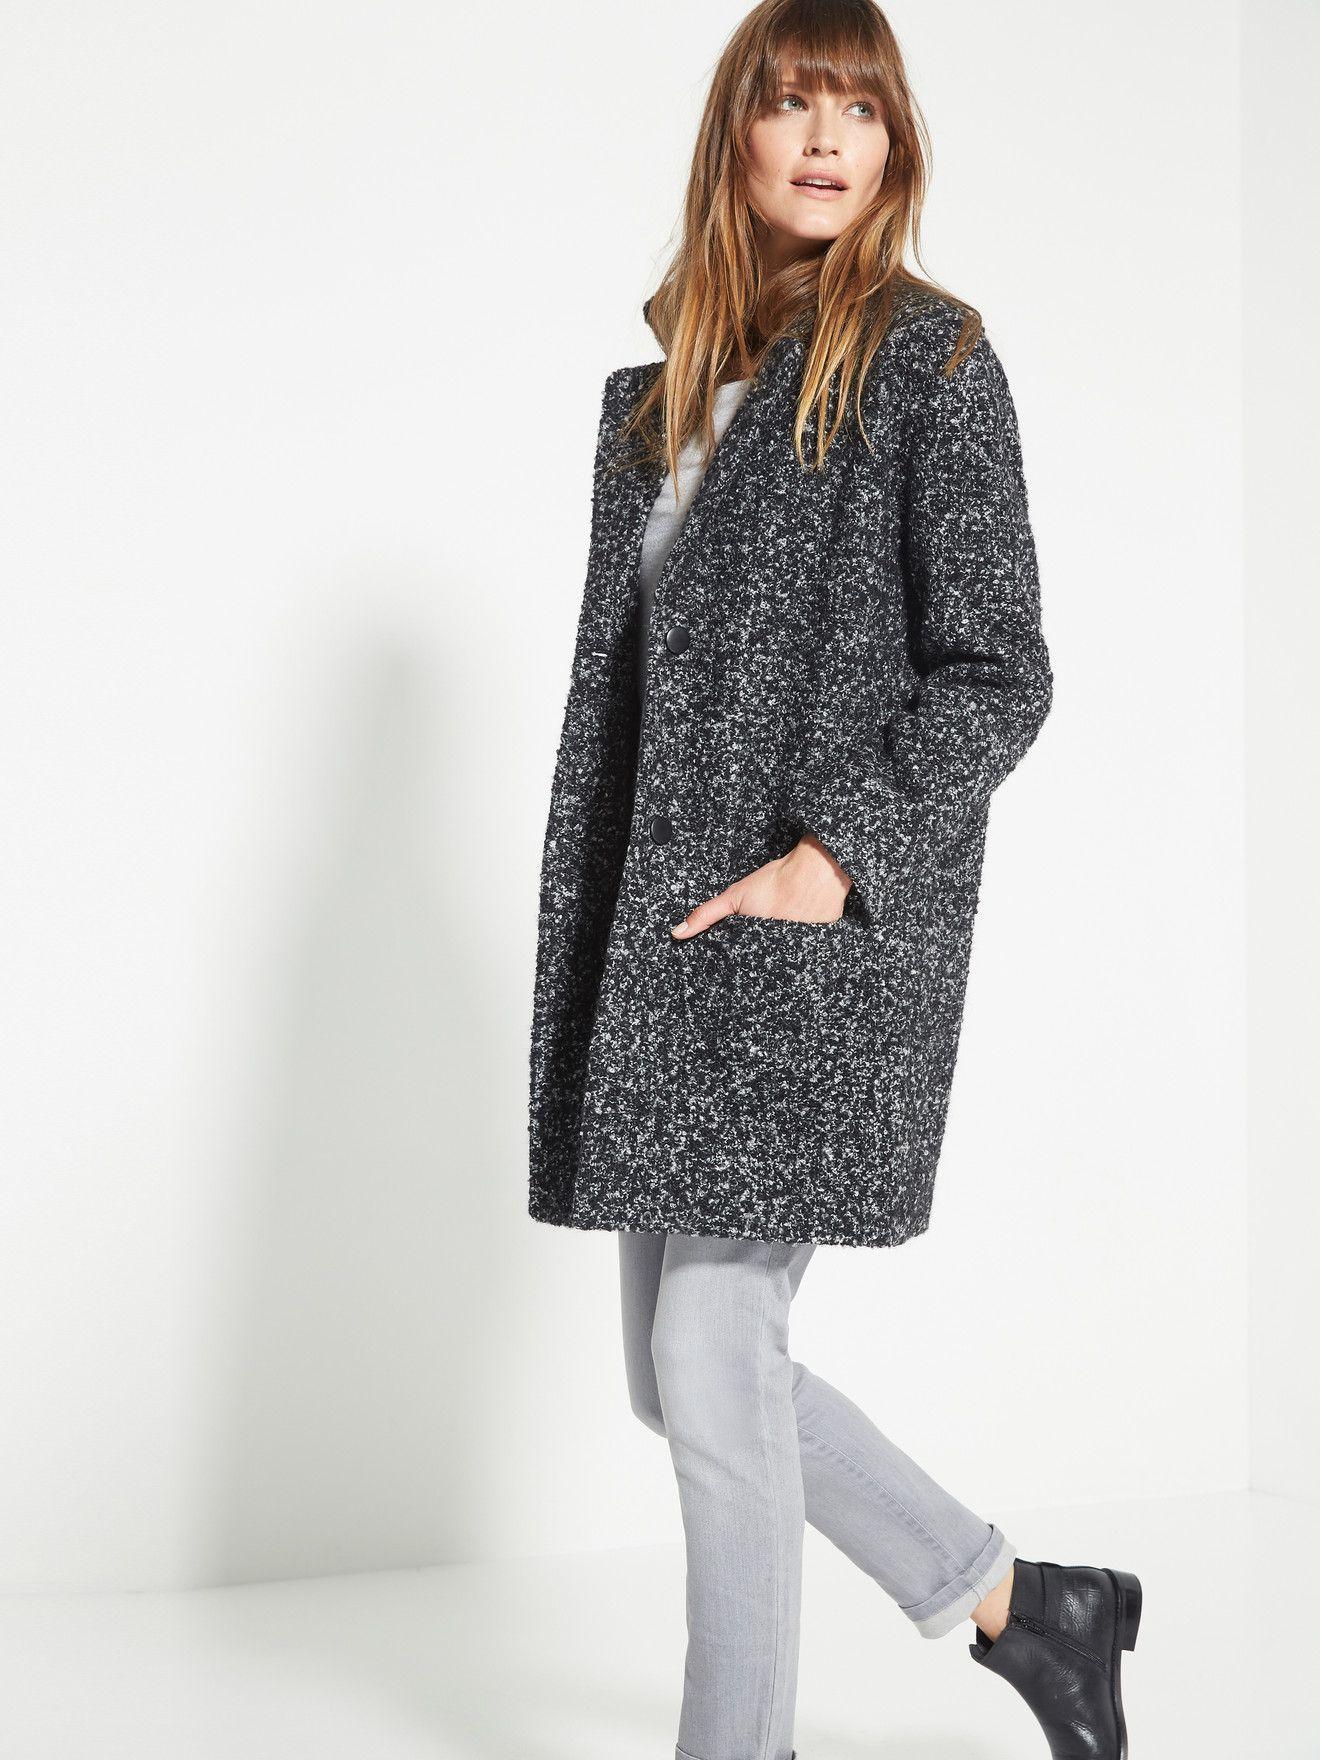 Laine Laine Femme Femme Tweed Tweed Deluxe1 Manteau Manteau Deluxe1 Tweed Manteau Laine FwSgq4Zn